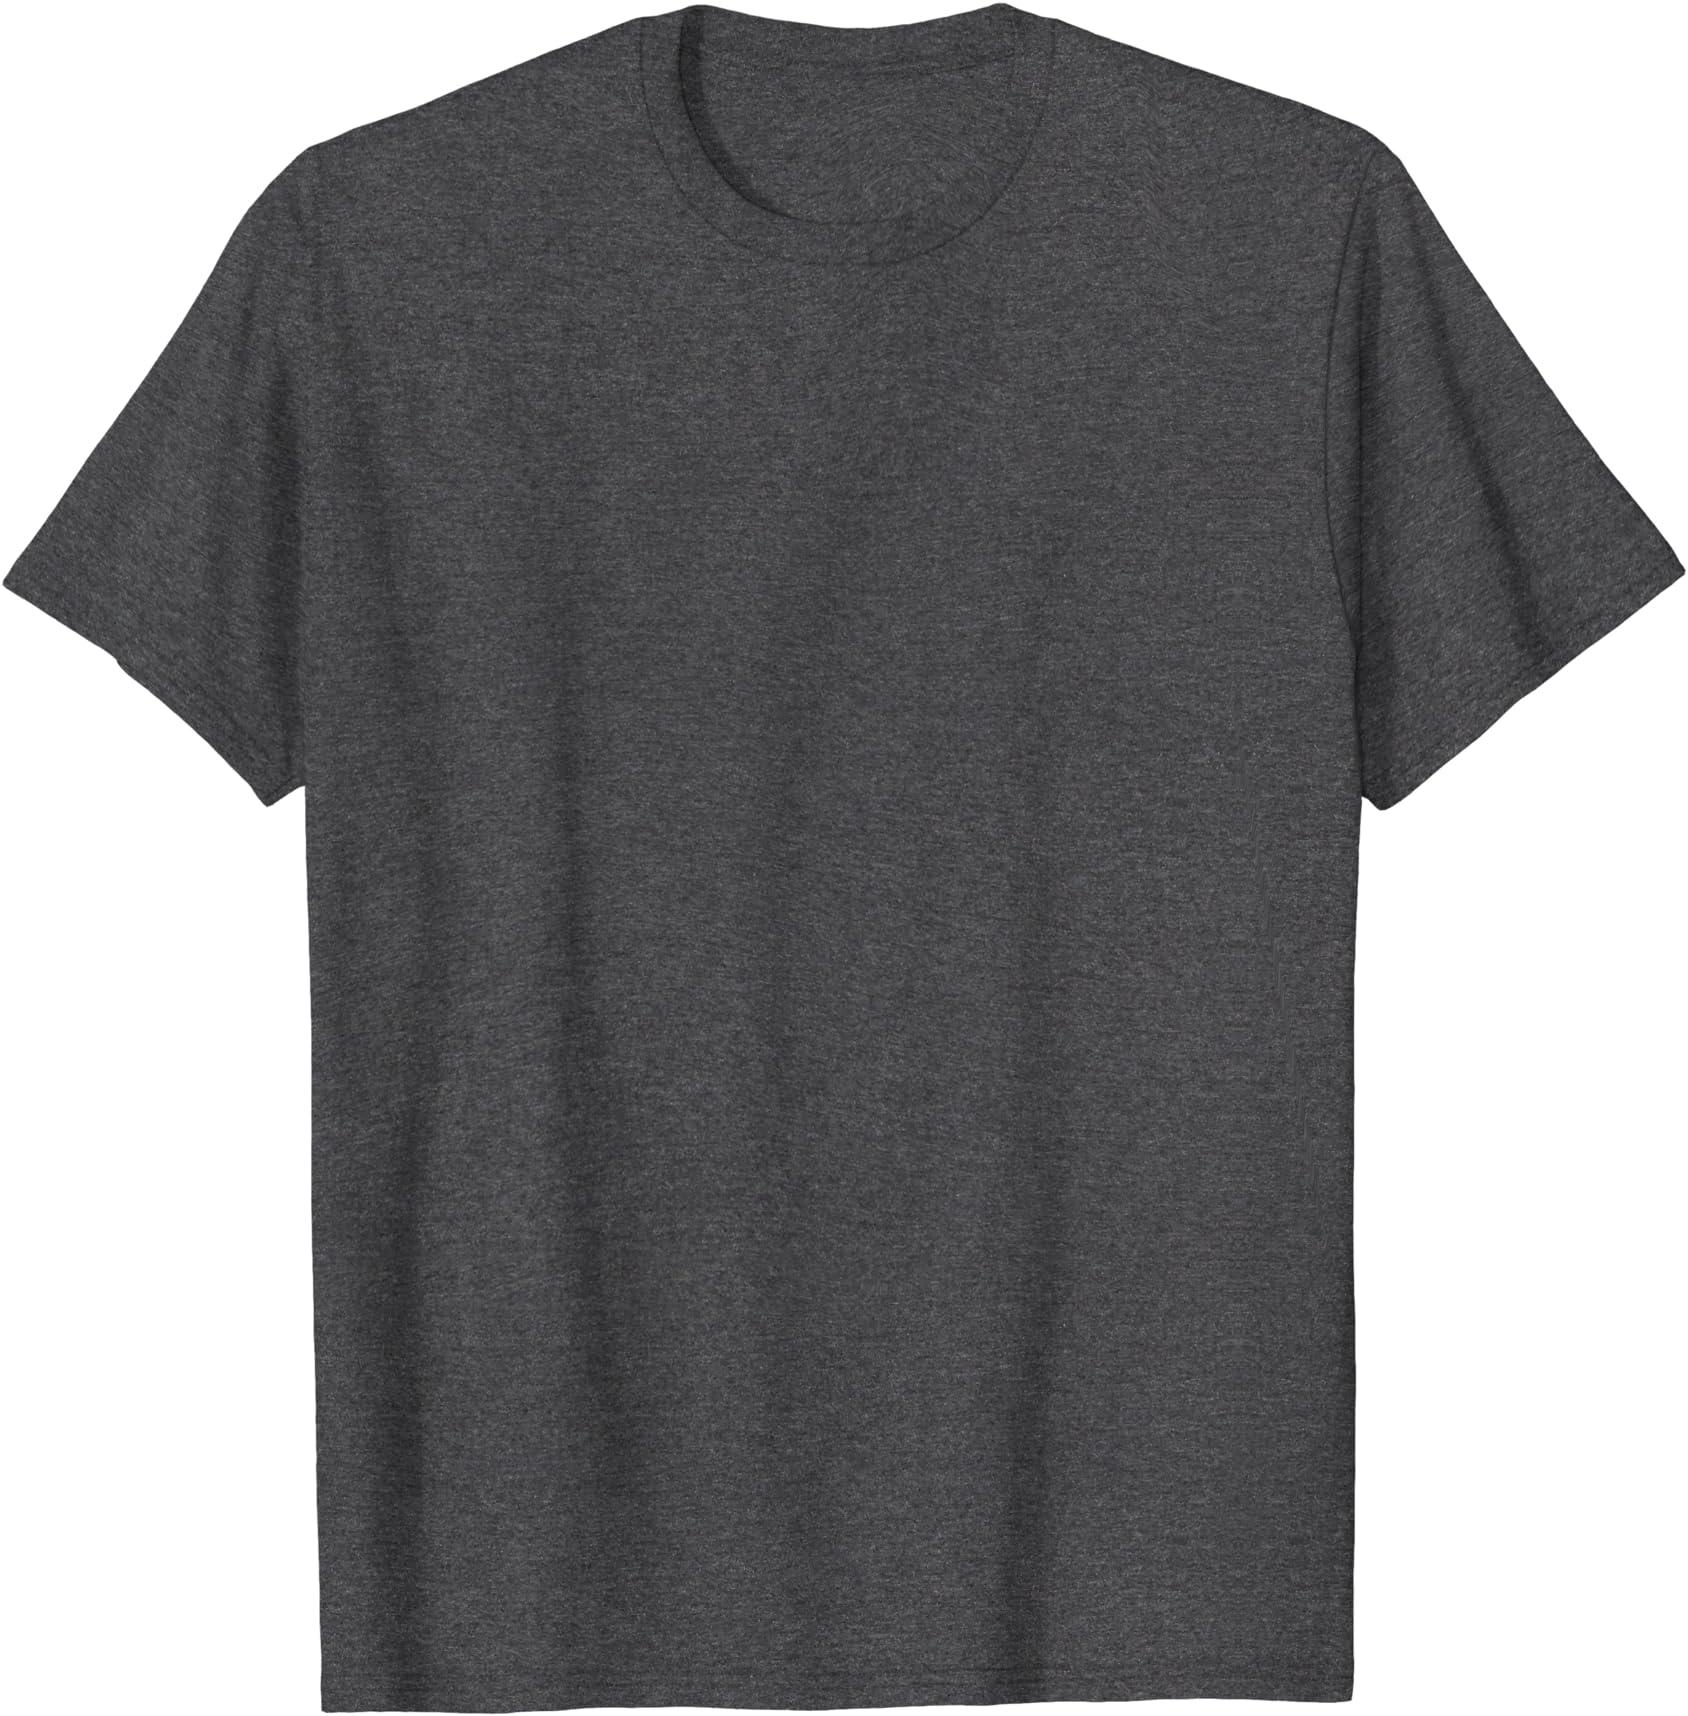 Scotland Cotton Tee Cameron Clan T-Shirt Scottish Heritage Clothing